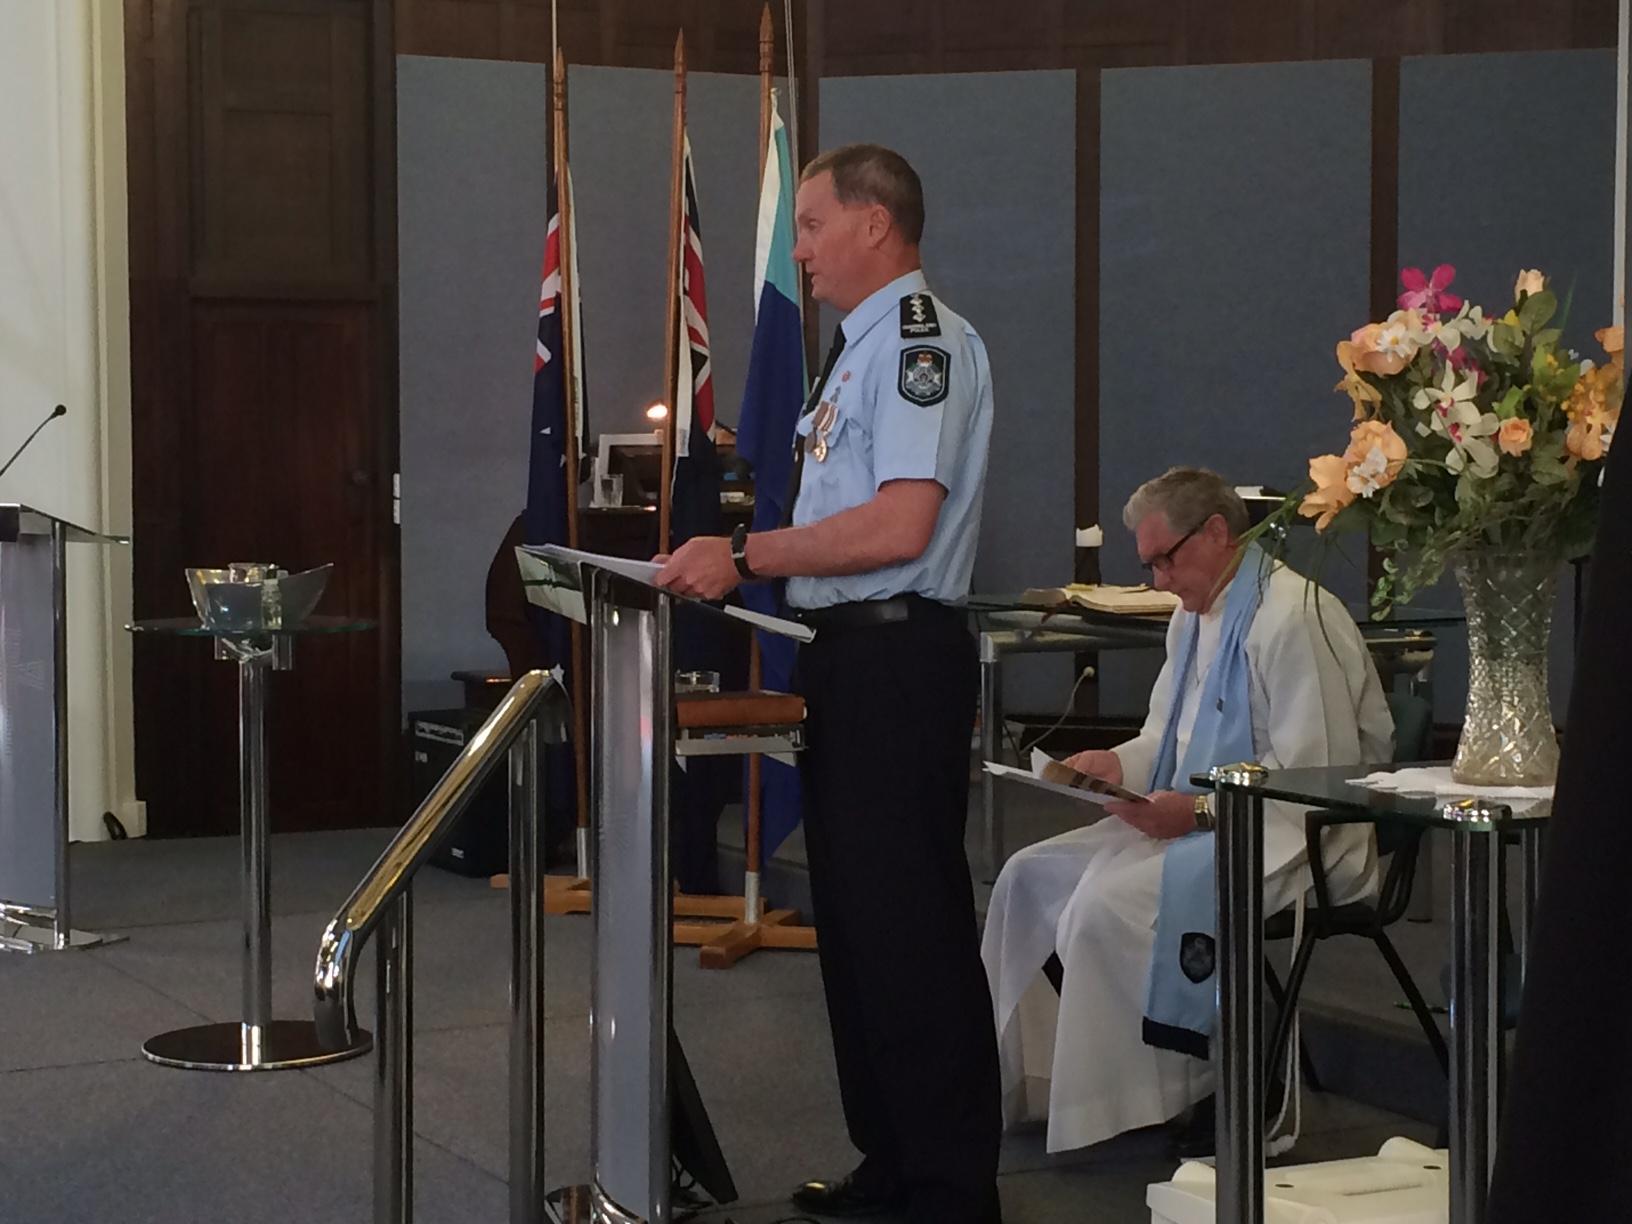 Police Remembrance Day Bundaberg 2015.